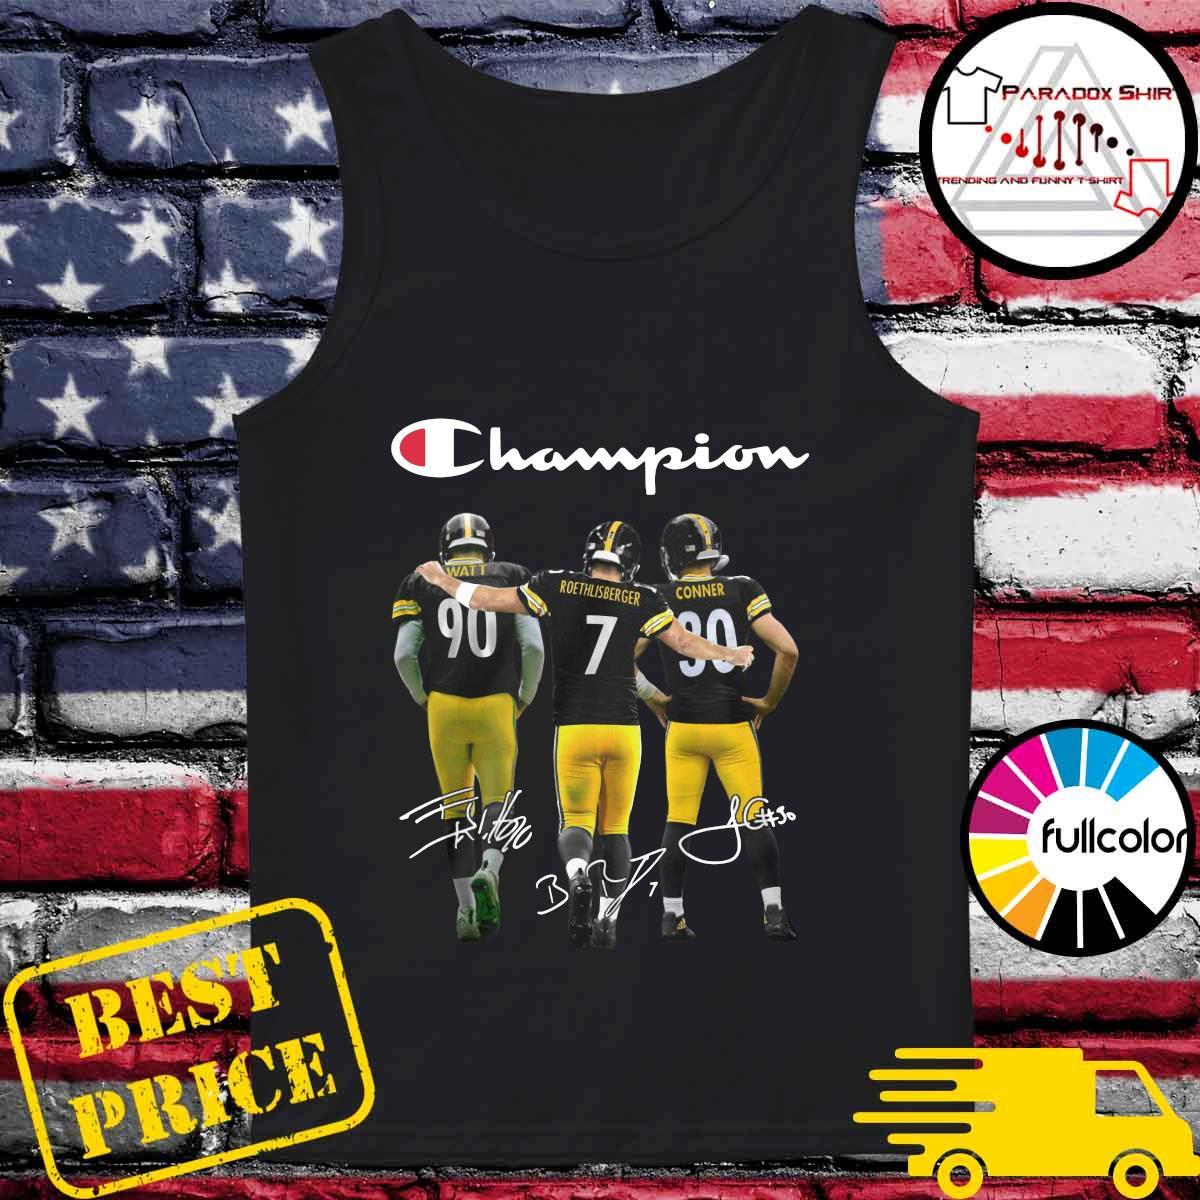 Champions Pittsburgh Steelers T J Watt 90 Ben Roethlisberger 7 James Conner 30 Signatures Shirt Tank-top